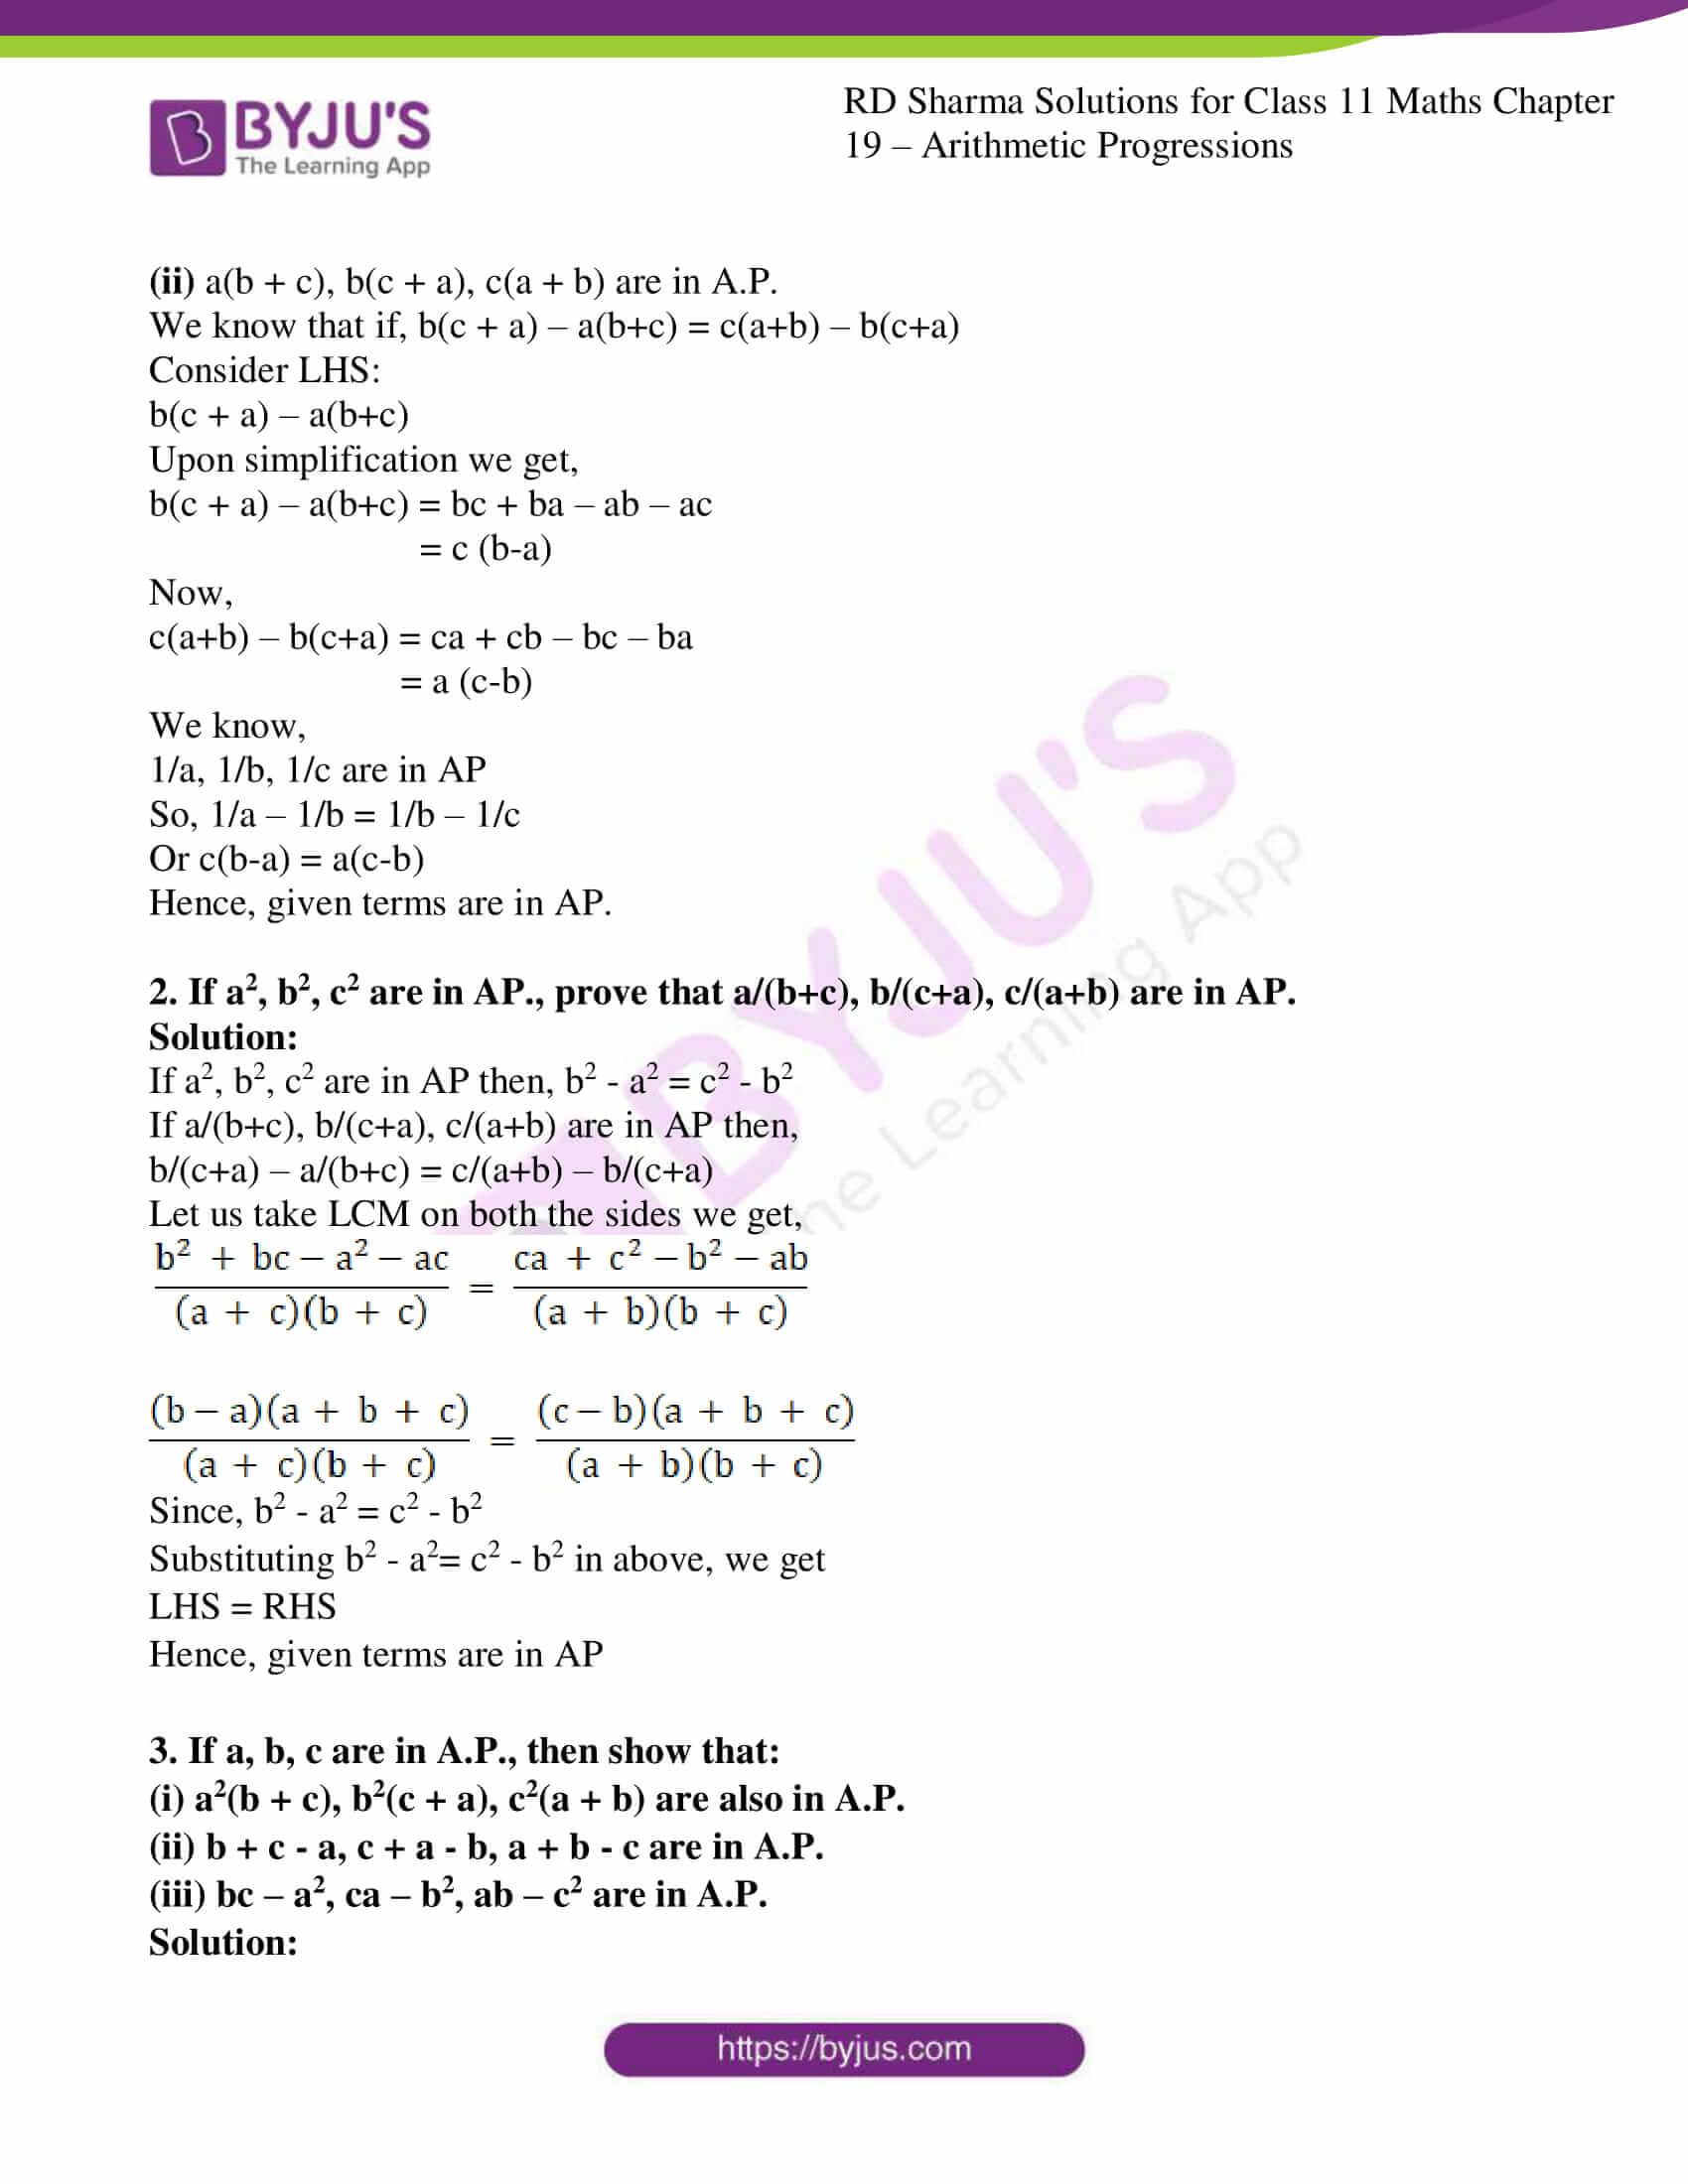 rd sharma class 11 maths ch 19 ex 5 2